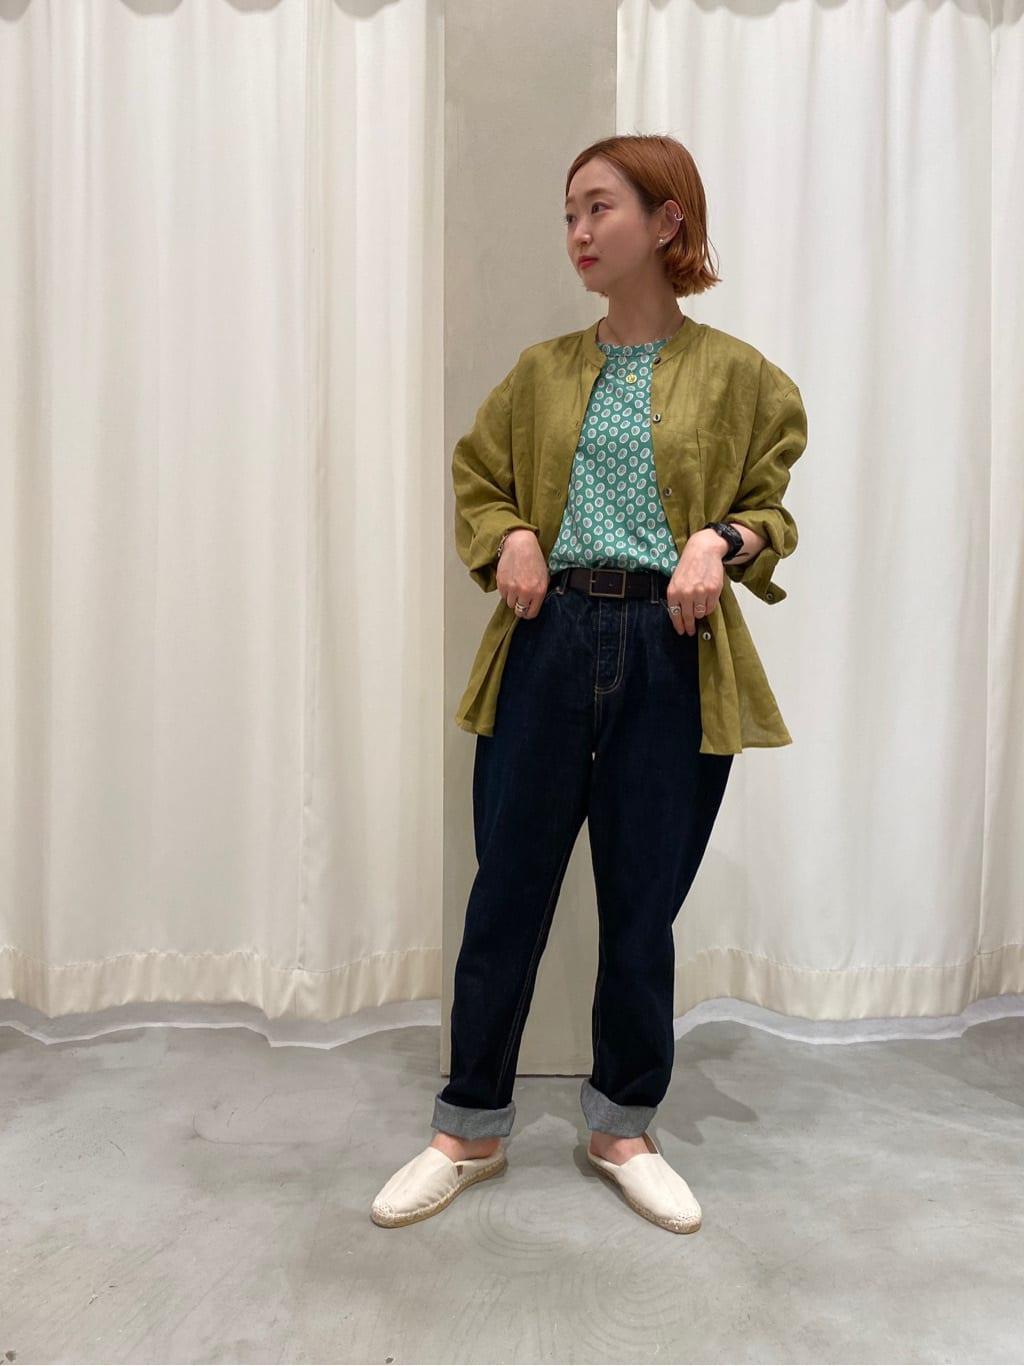 - CHILD WOMAN CHILD WOMAN , PAR ICI 東京スカイツリータウン・ソラマチ 身長:150cm 2021.07.15